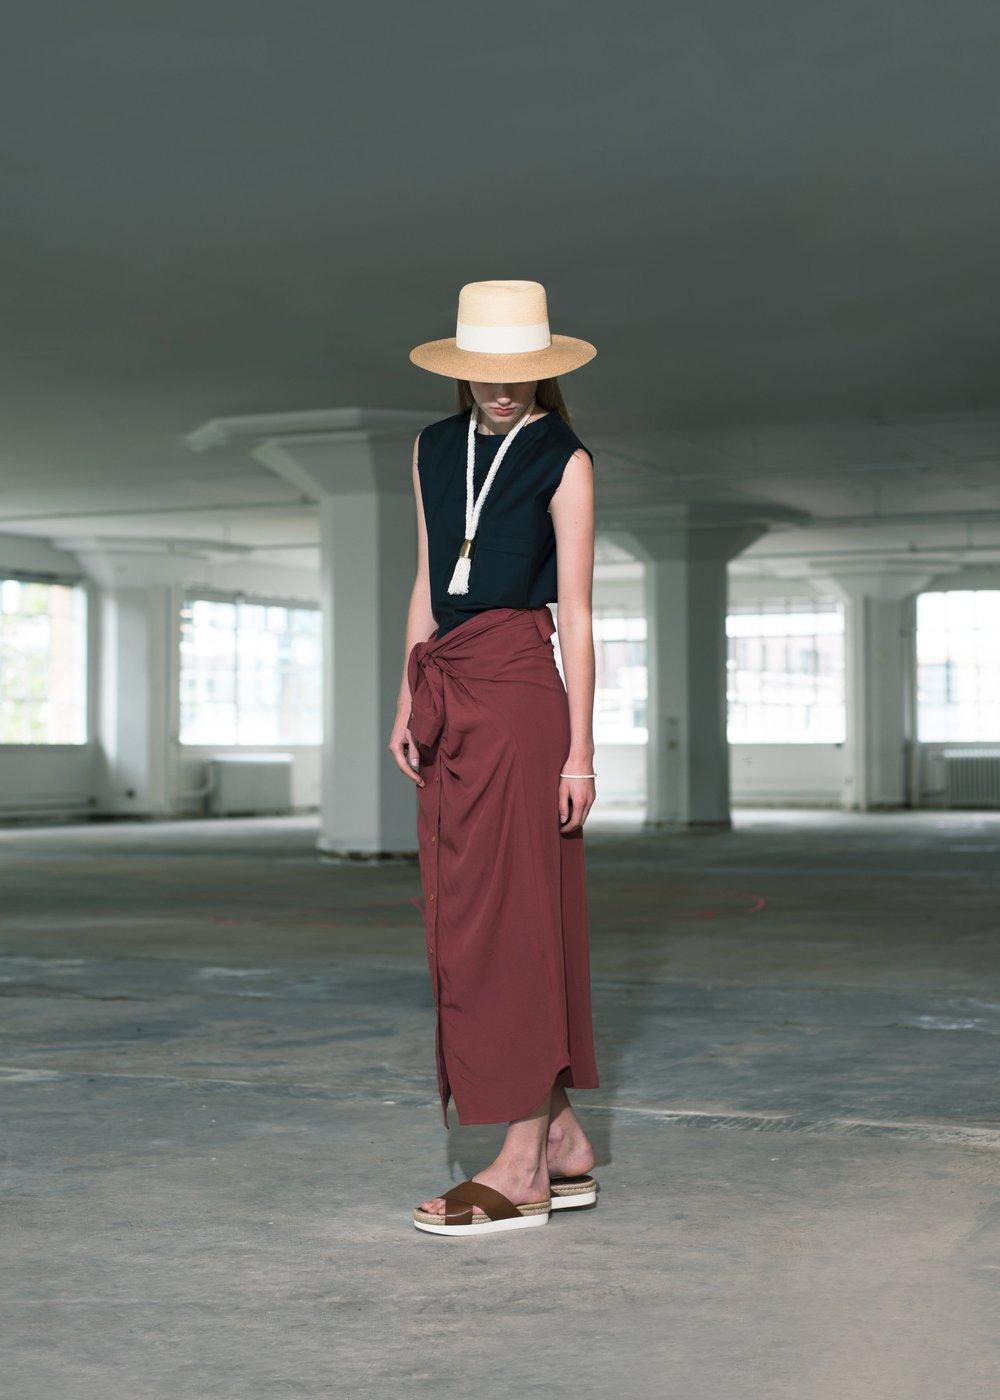 Fashion_B&C_Hats_CMH_8767-retouched-2.JPG